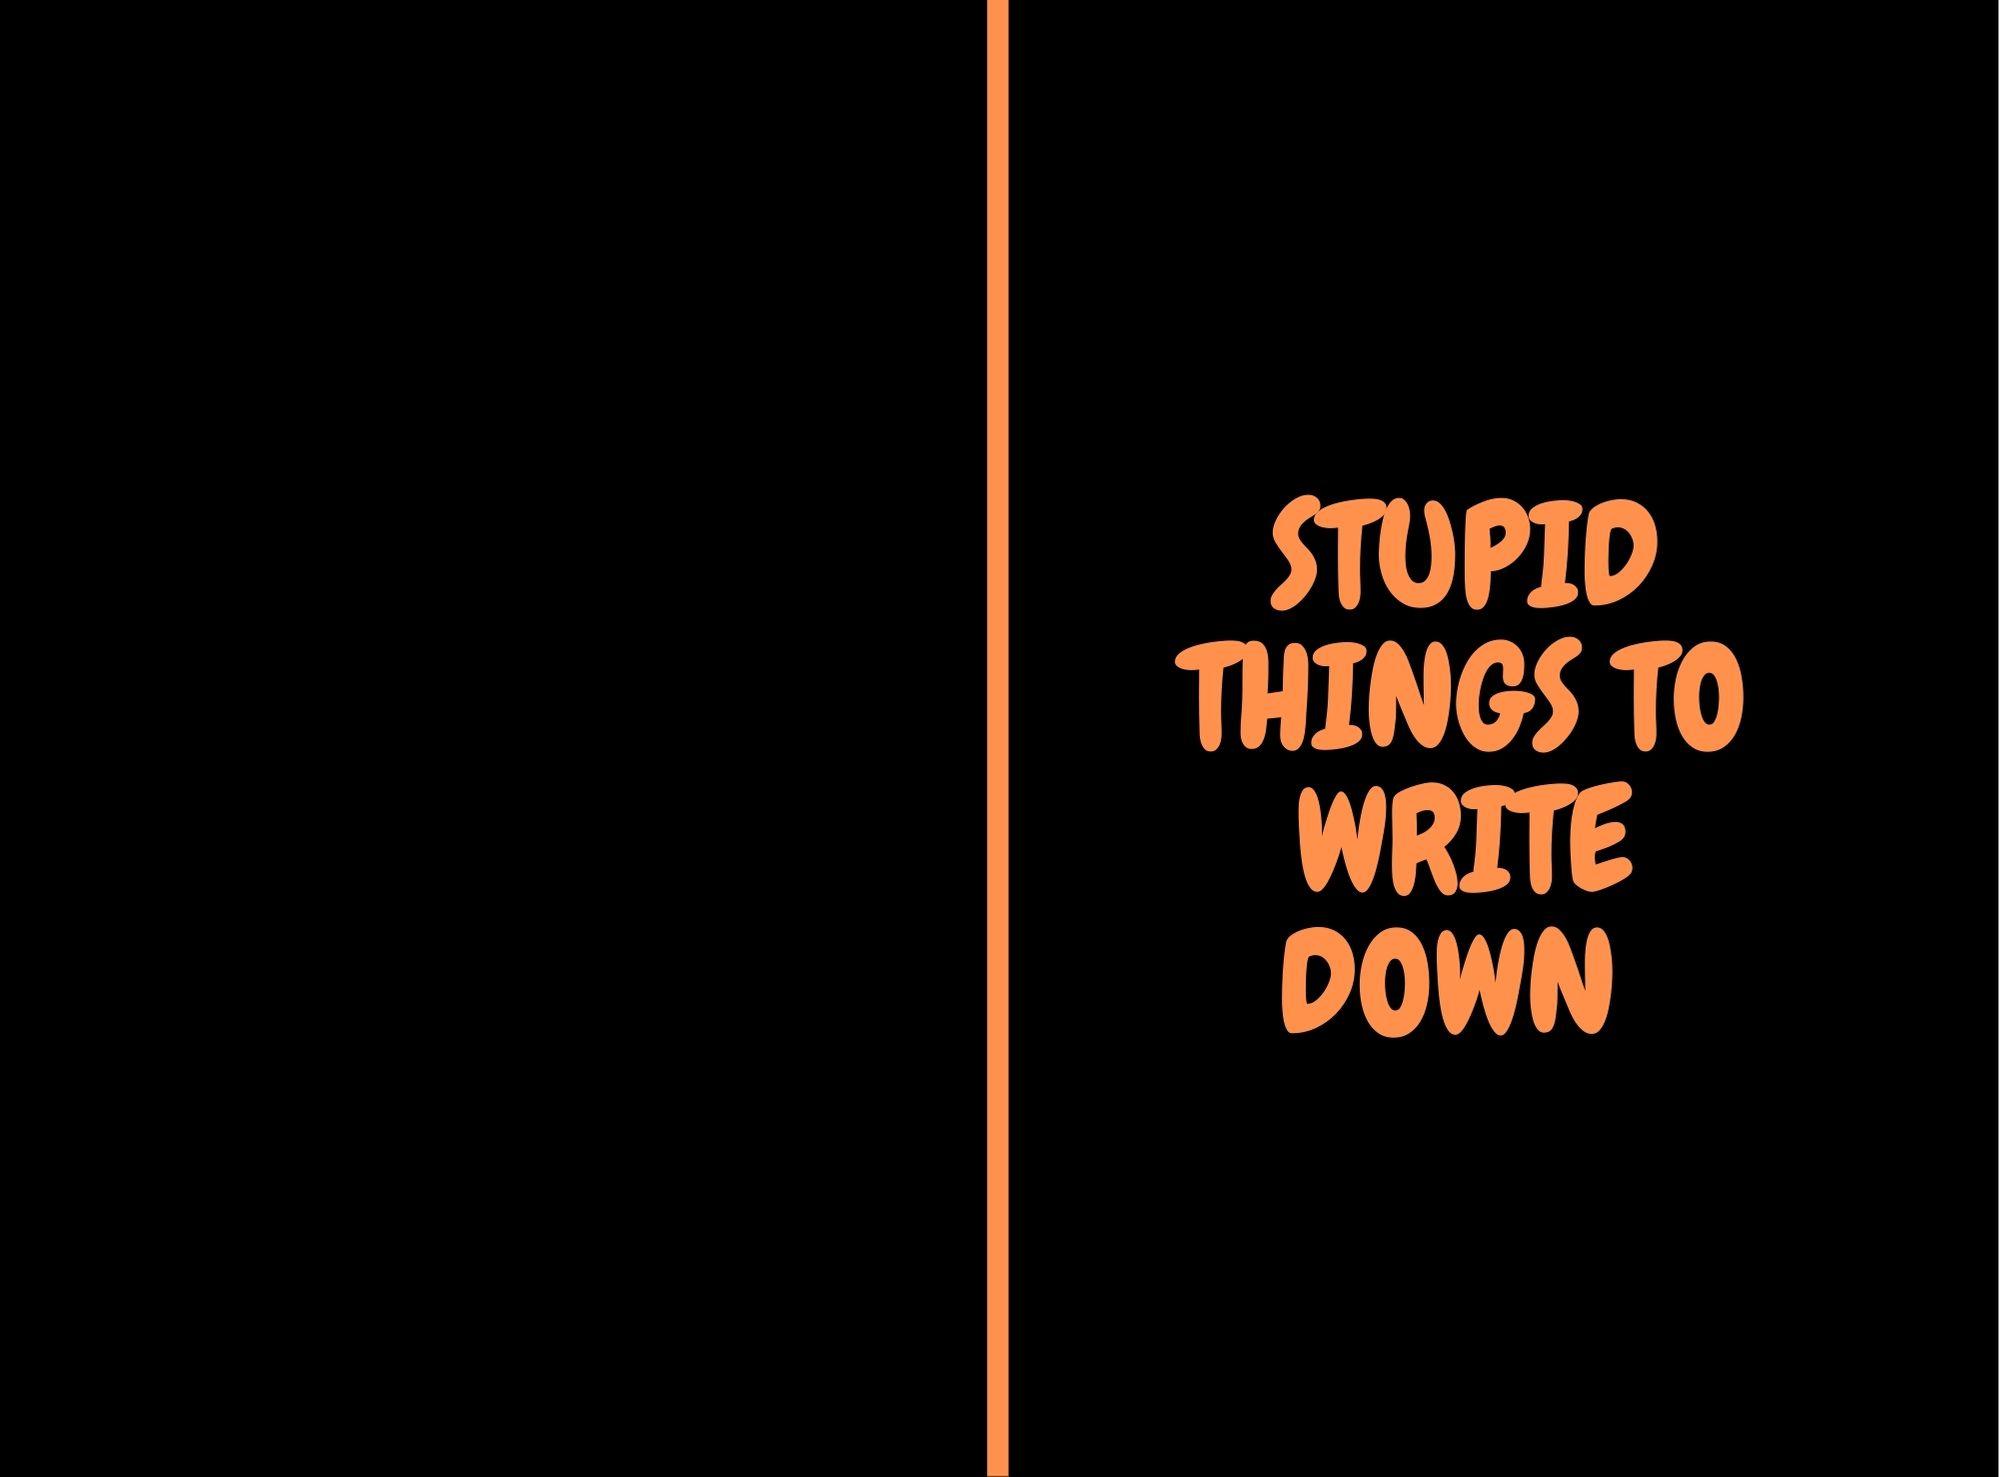 STUPID THINGS (1)